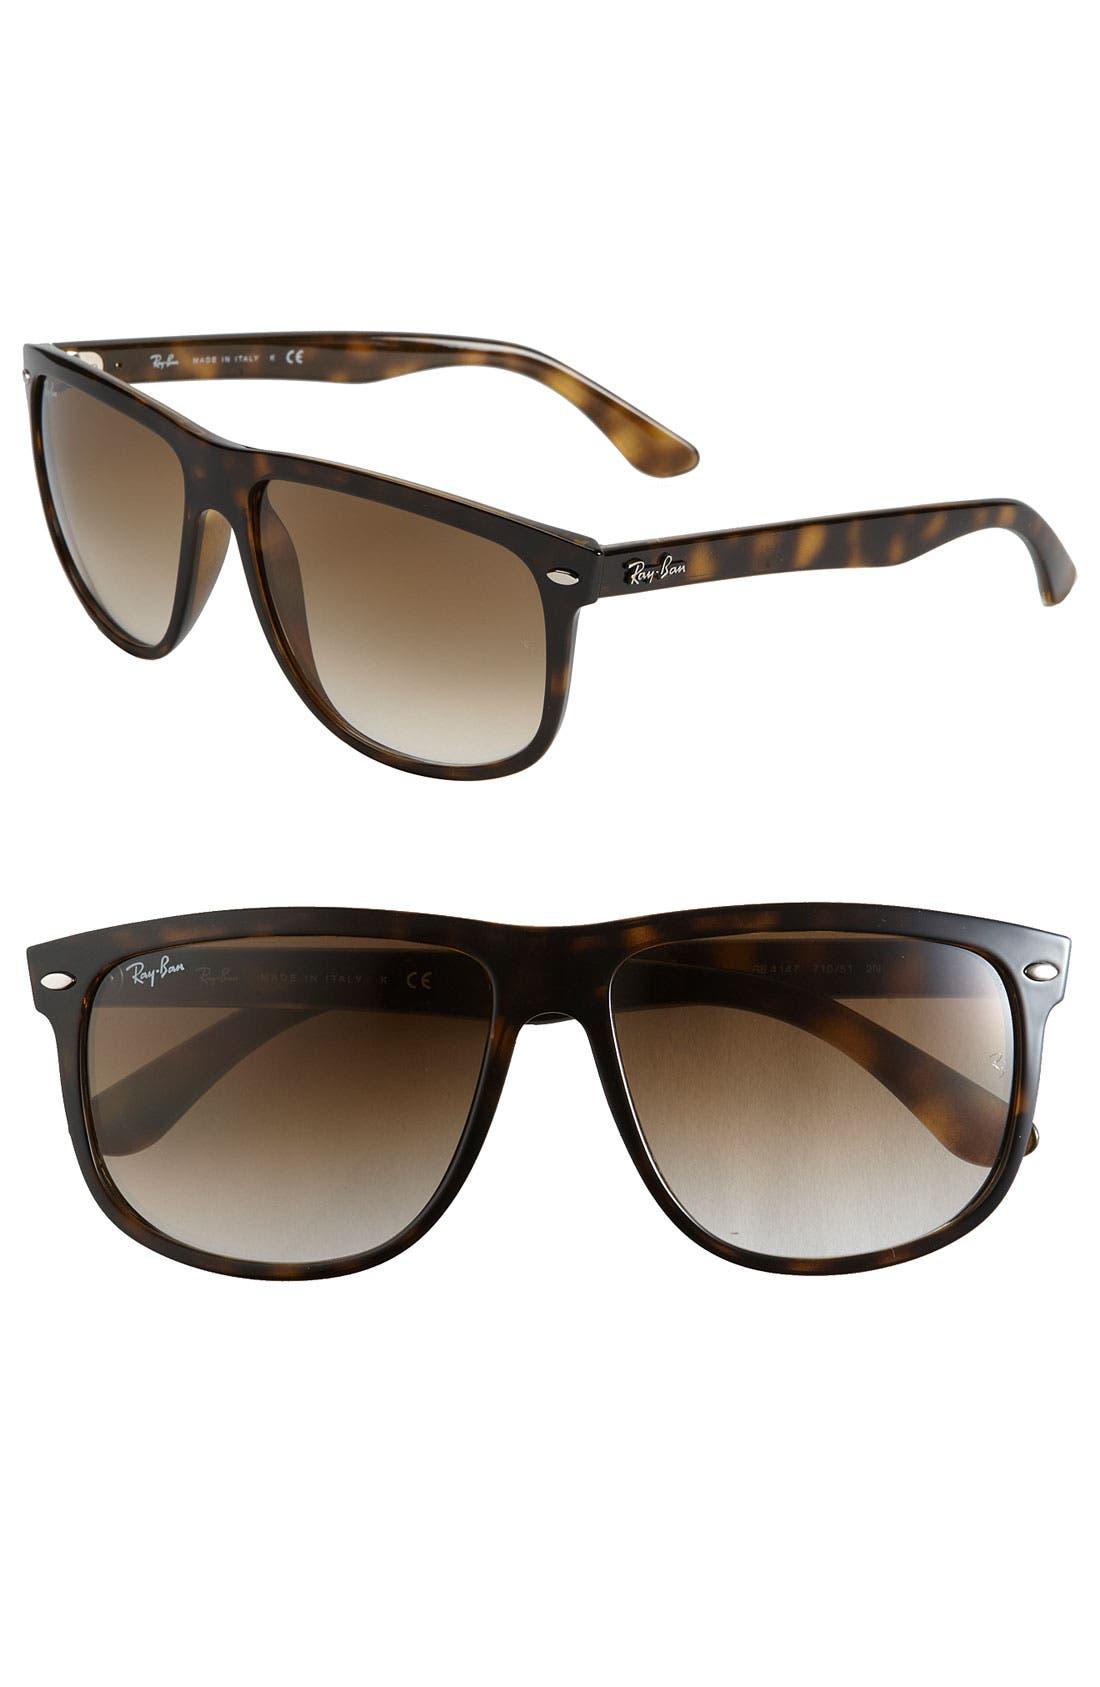 RAY-BAN, Boyfriend 60mm Flat Top Sunglasses, Main thumbnail 1, color, TORTOISE GRADIENT